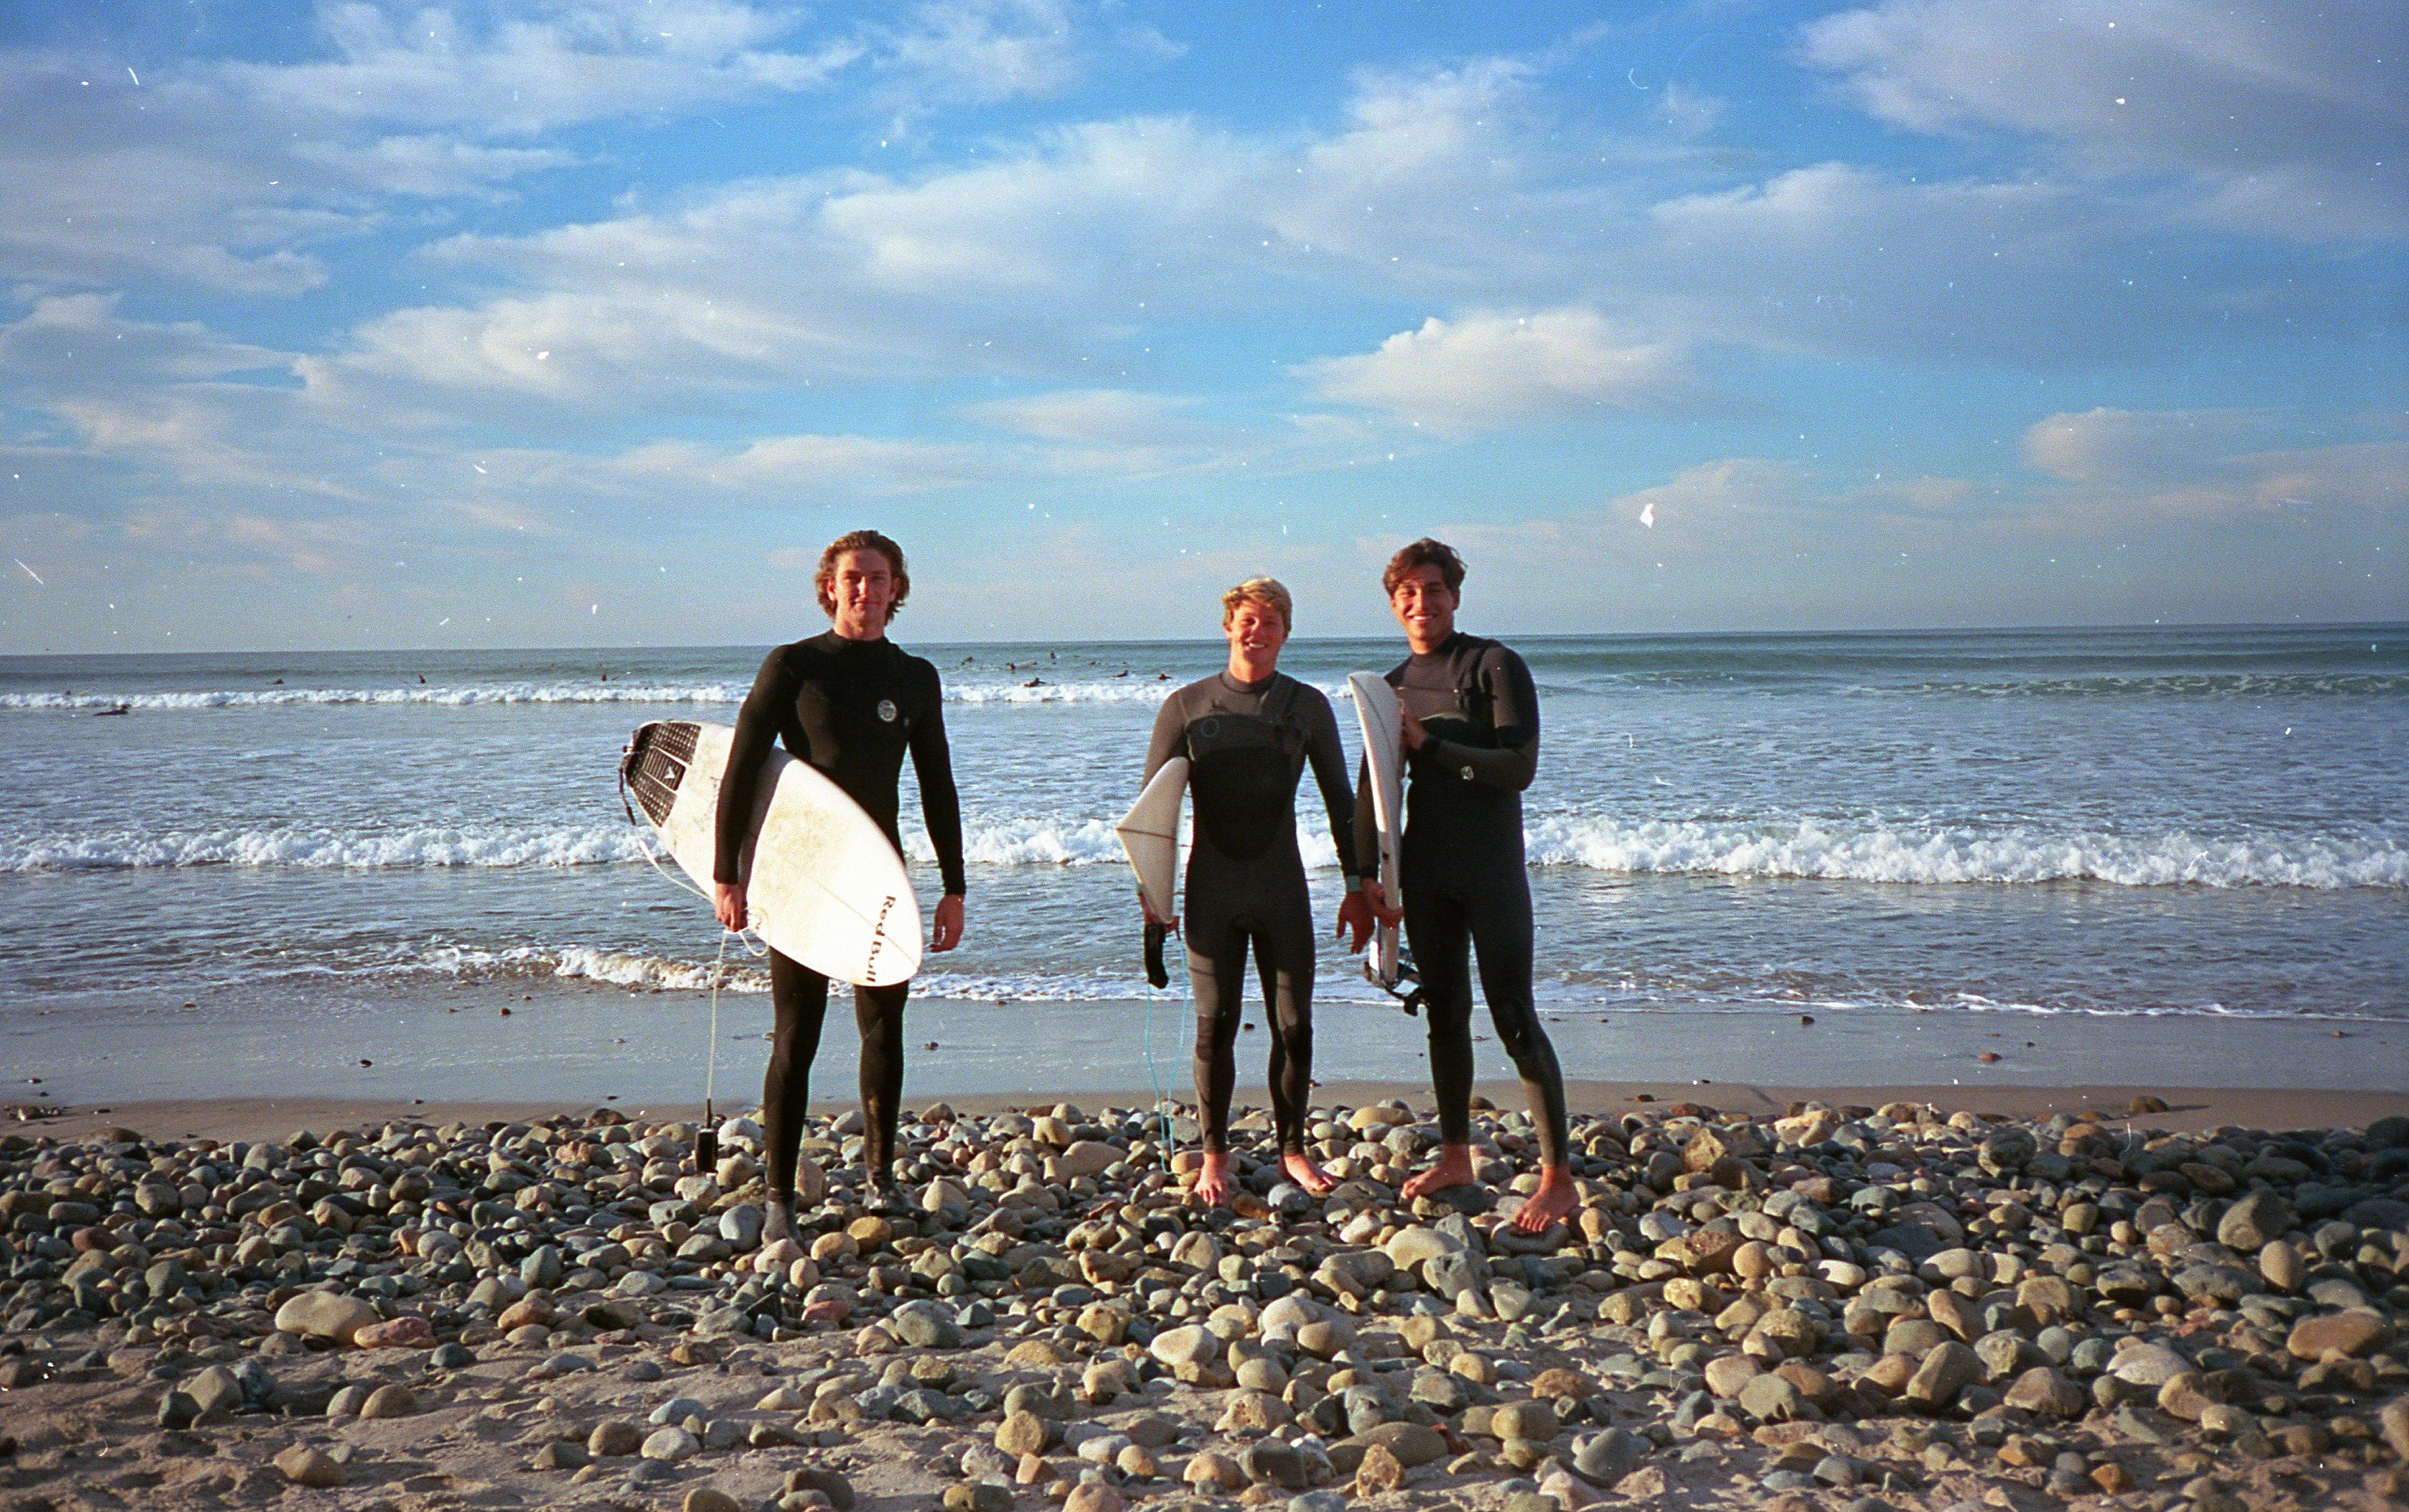 Surfer students Genie